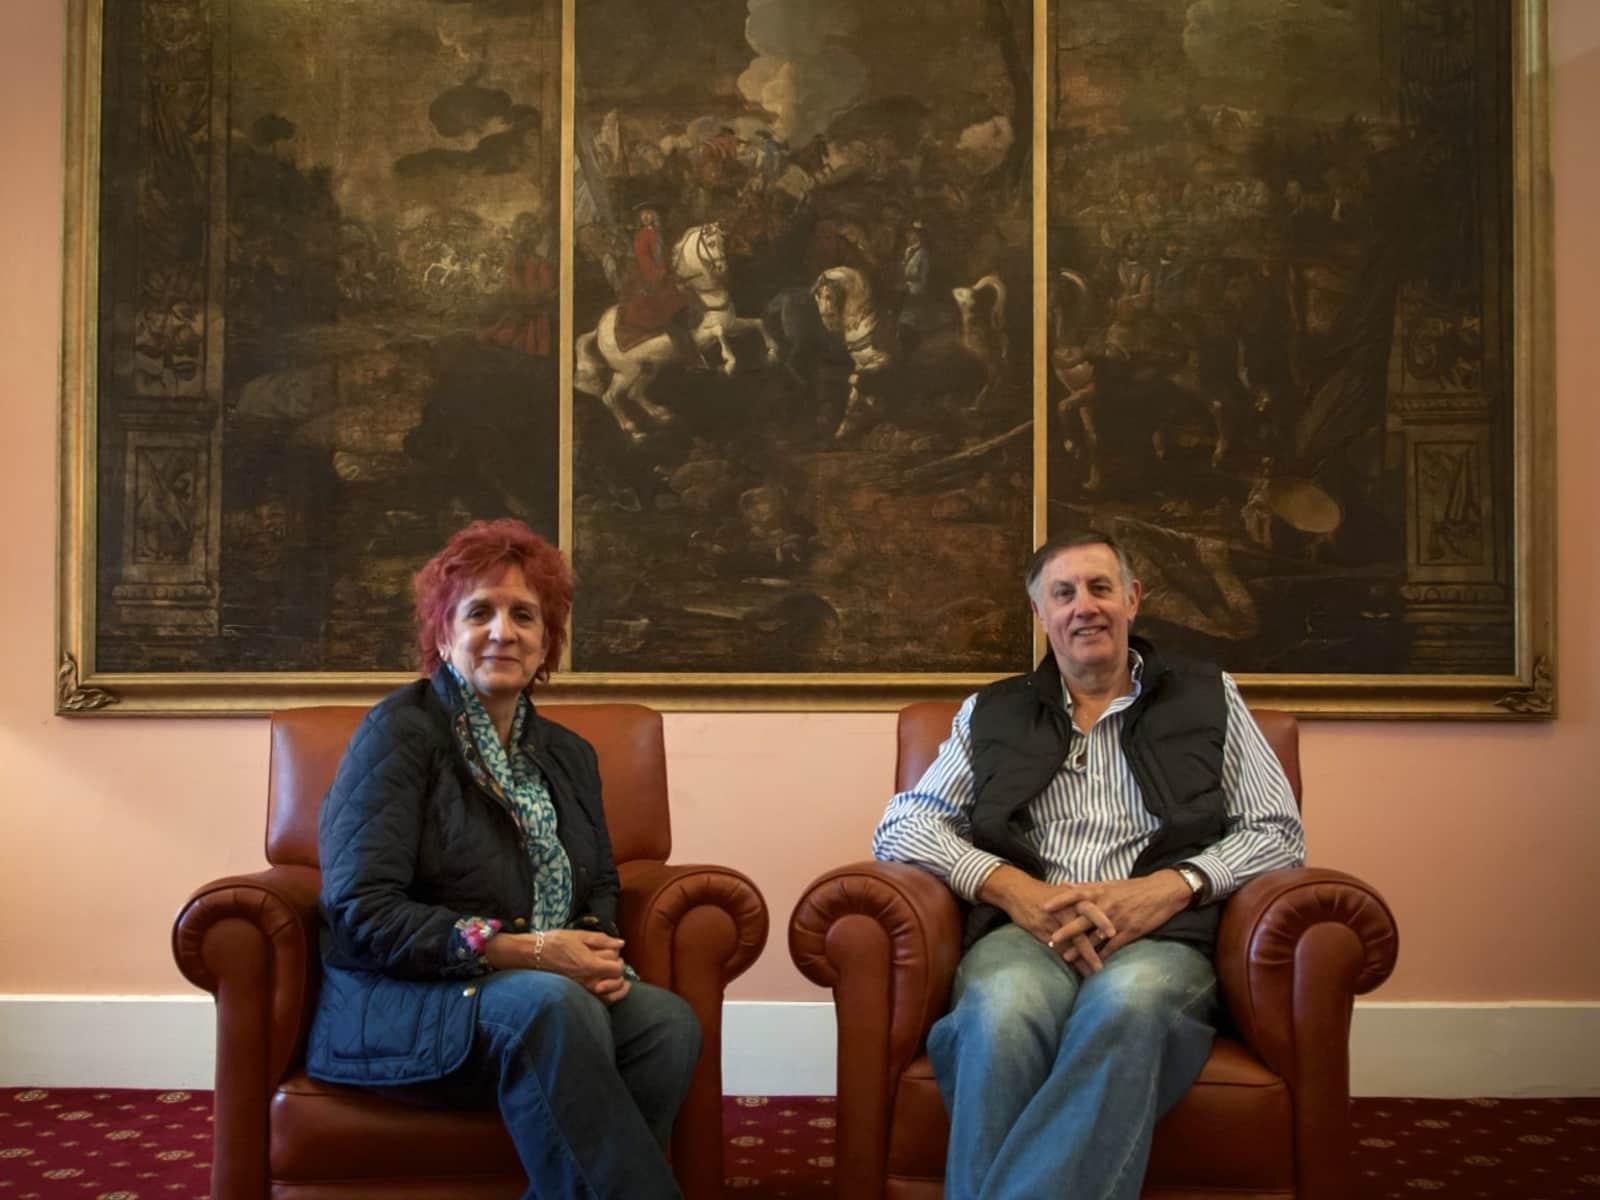 Jan & John from England, United Kingdom